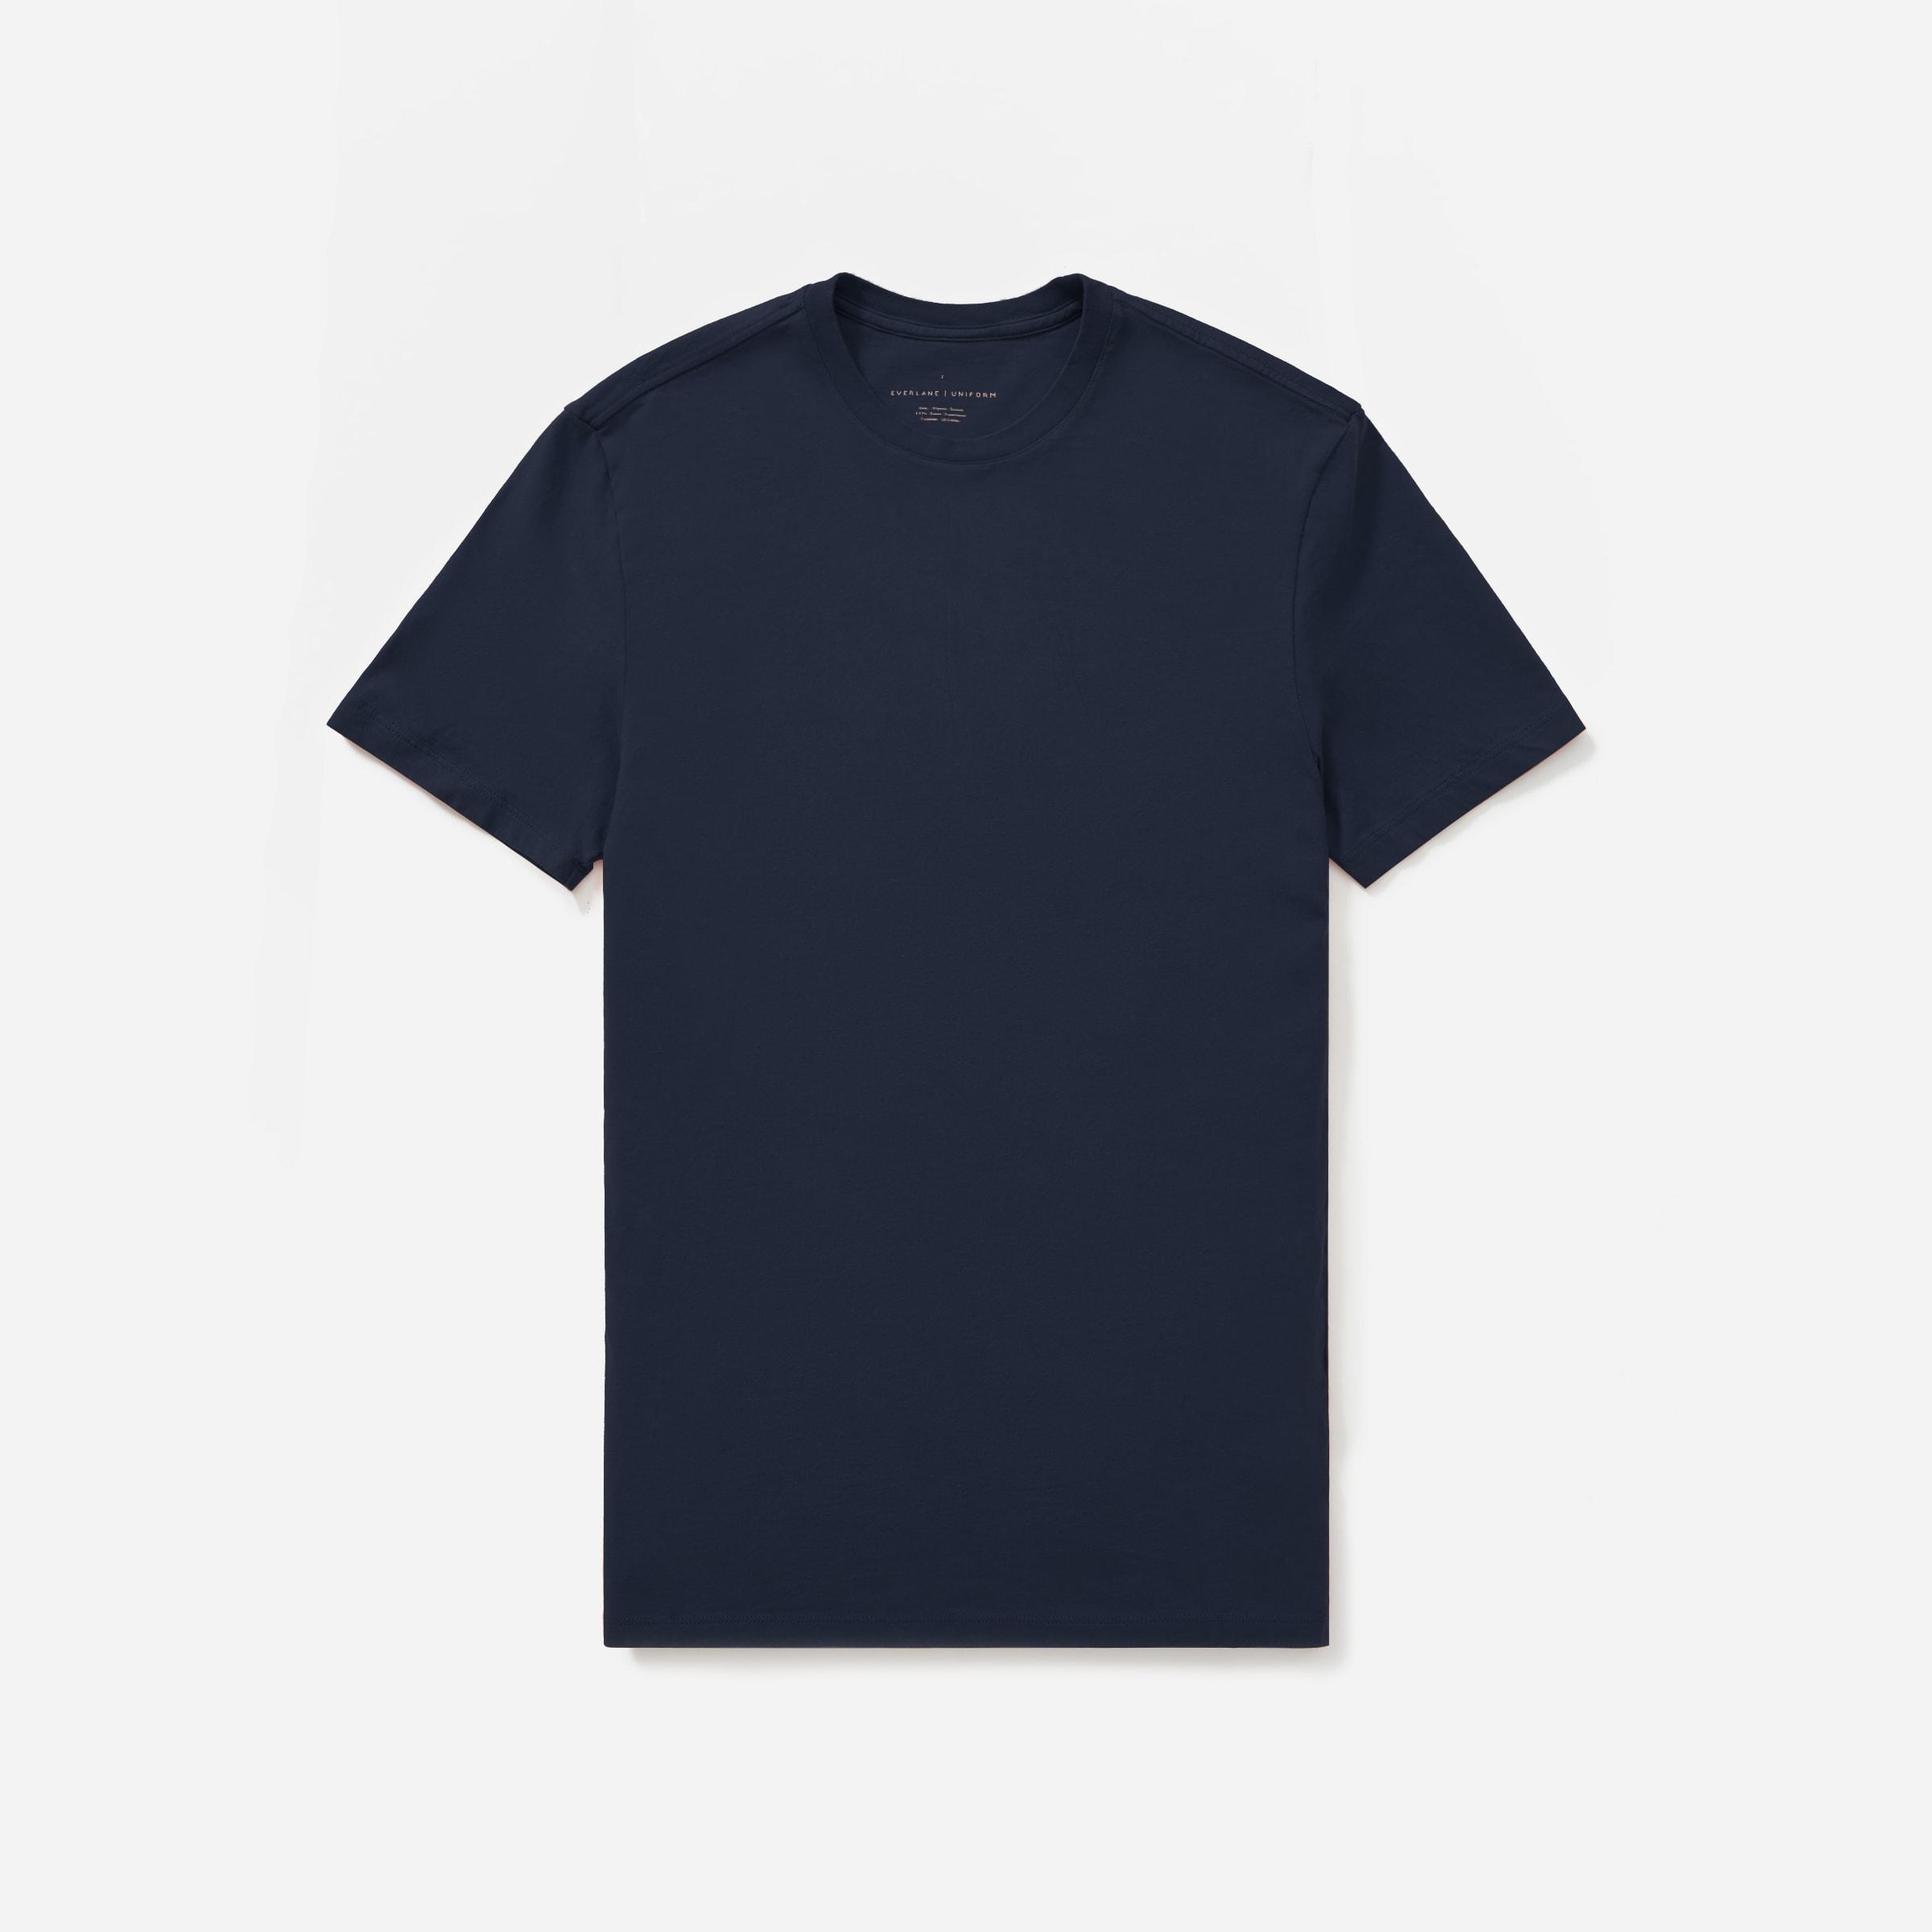 Everlane Organic Cotton T-Shirts